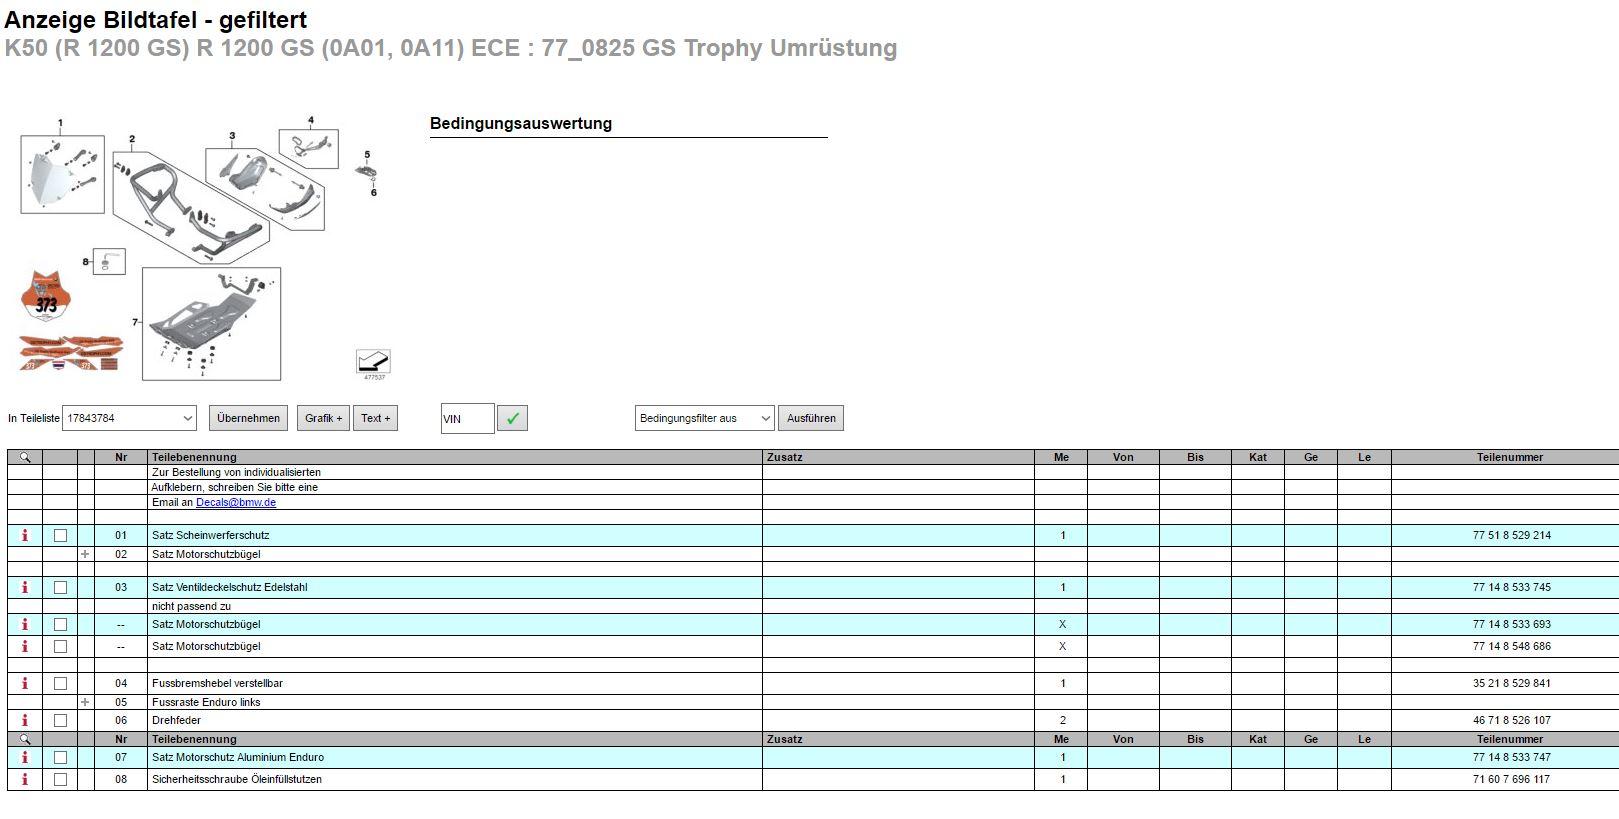 st-rtzbigel-trophy.jpg